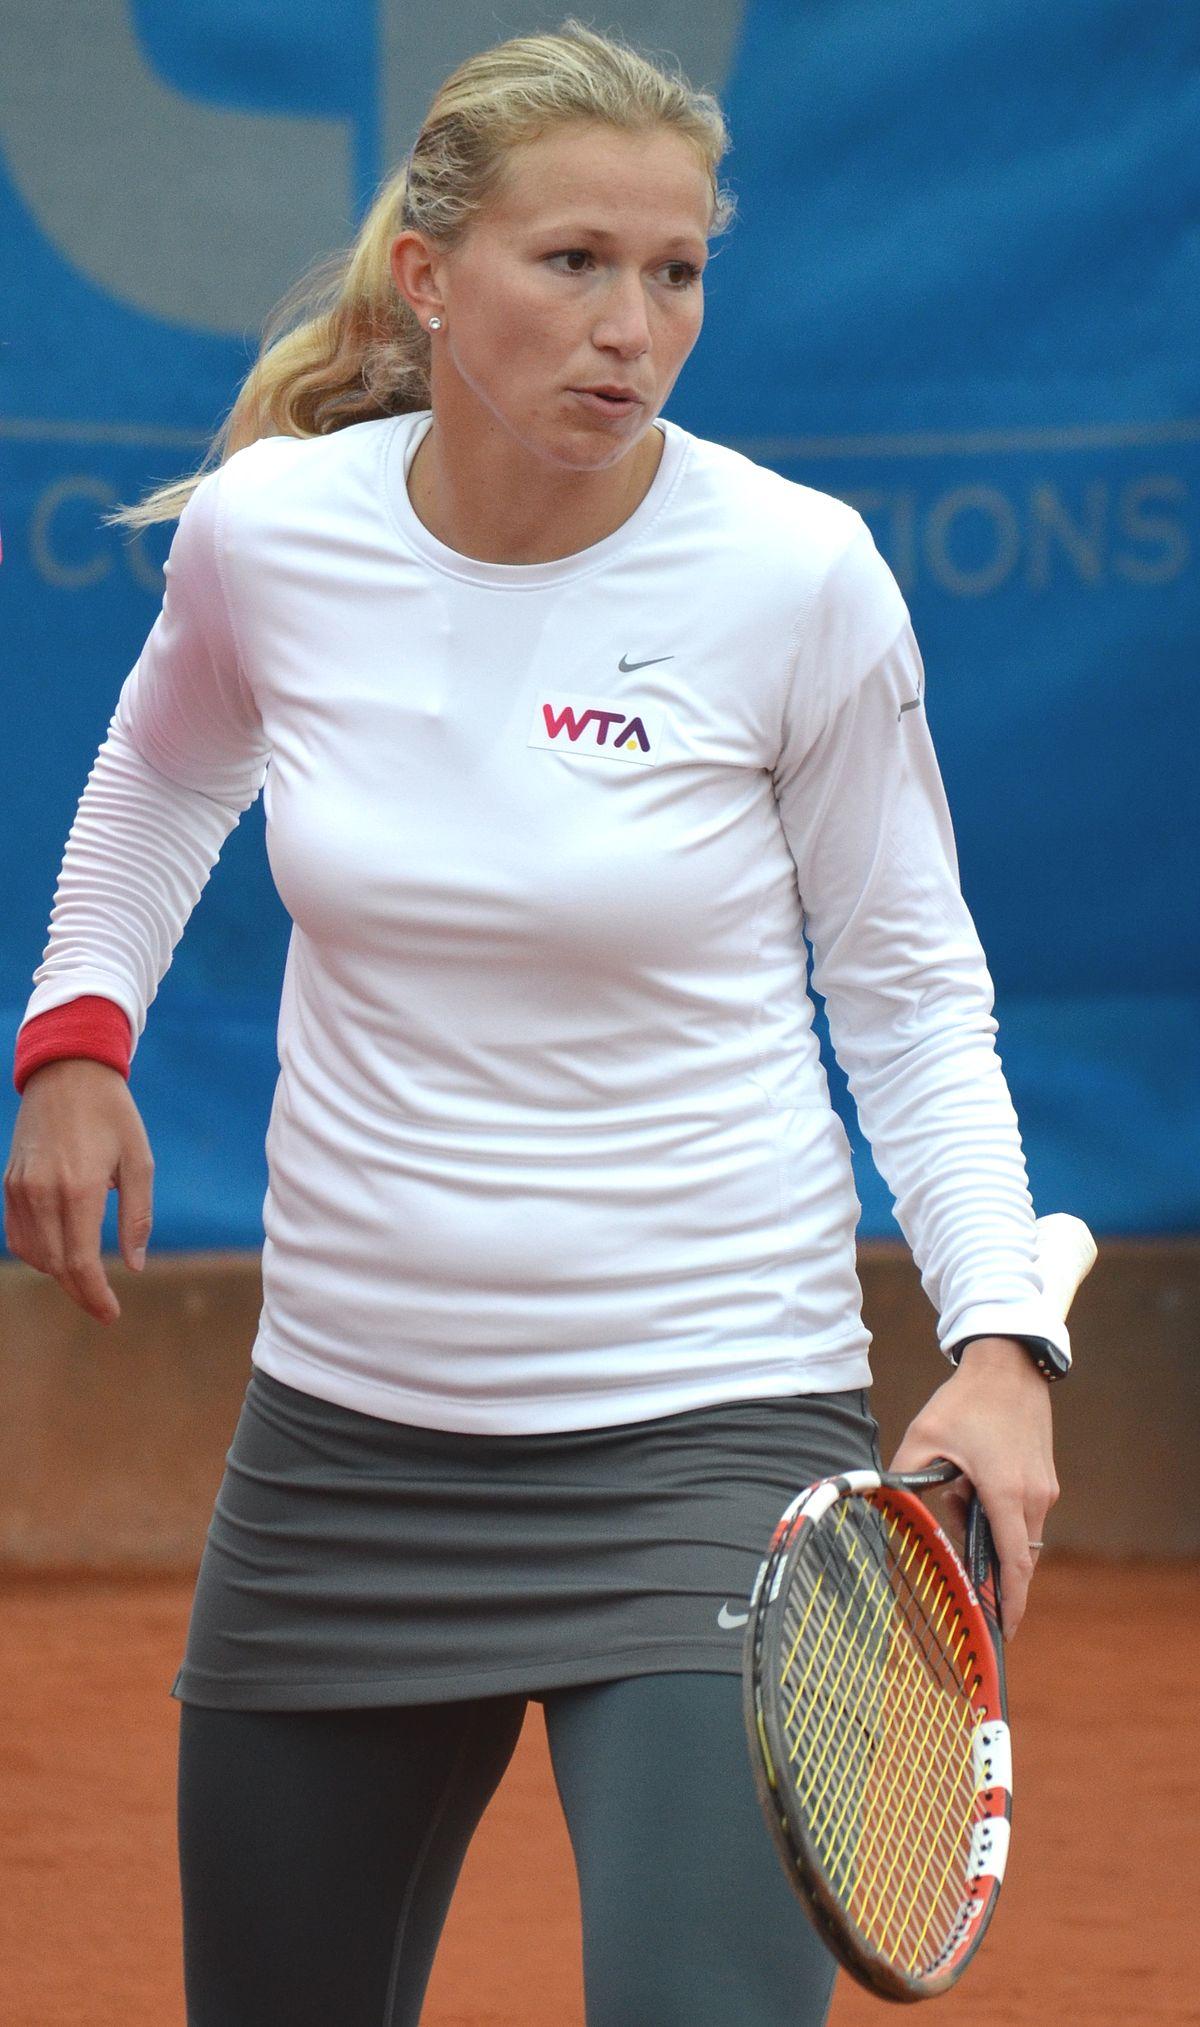 Michaëlla Krajicek earned a  million dollar salary - leaving the net worth at 1.5 million in 2018